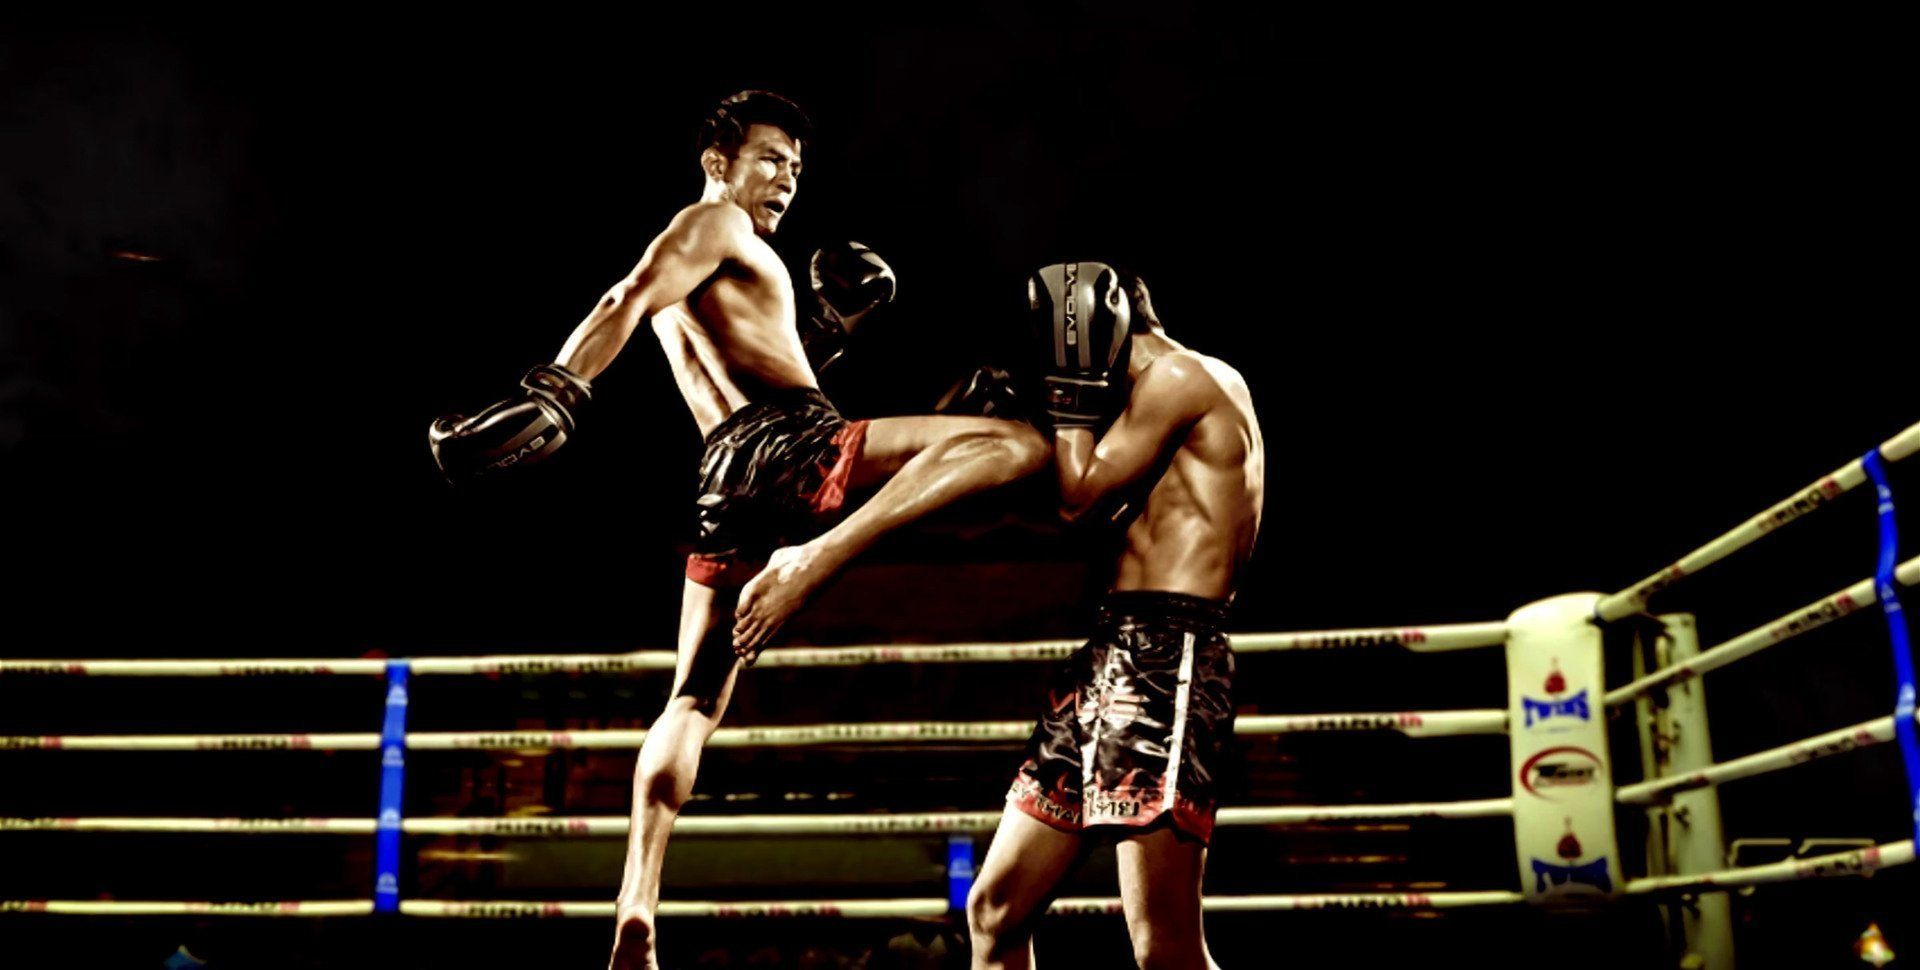 Liberlupus UFC, Sparring, Muay Thai, MMA Gloves | RWA Sportswear